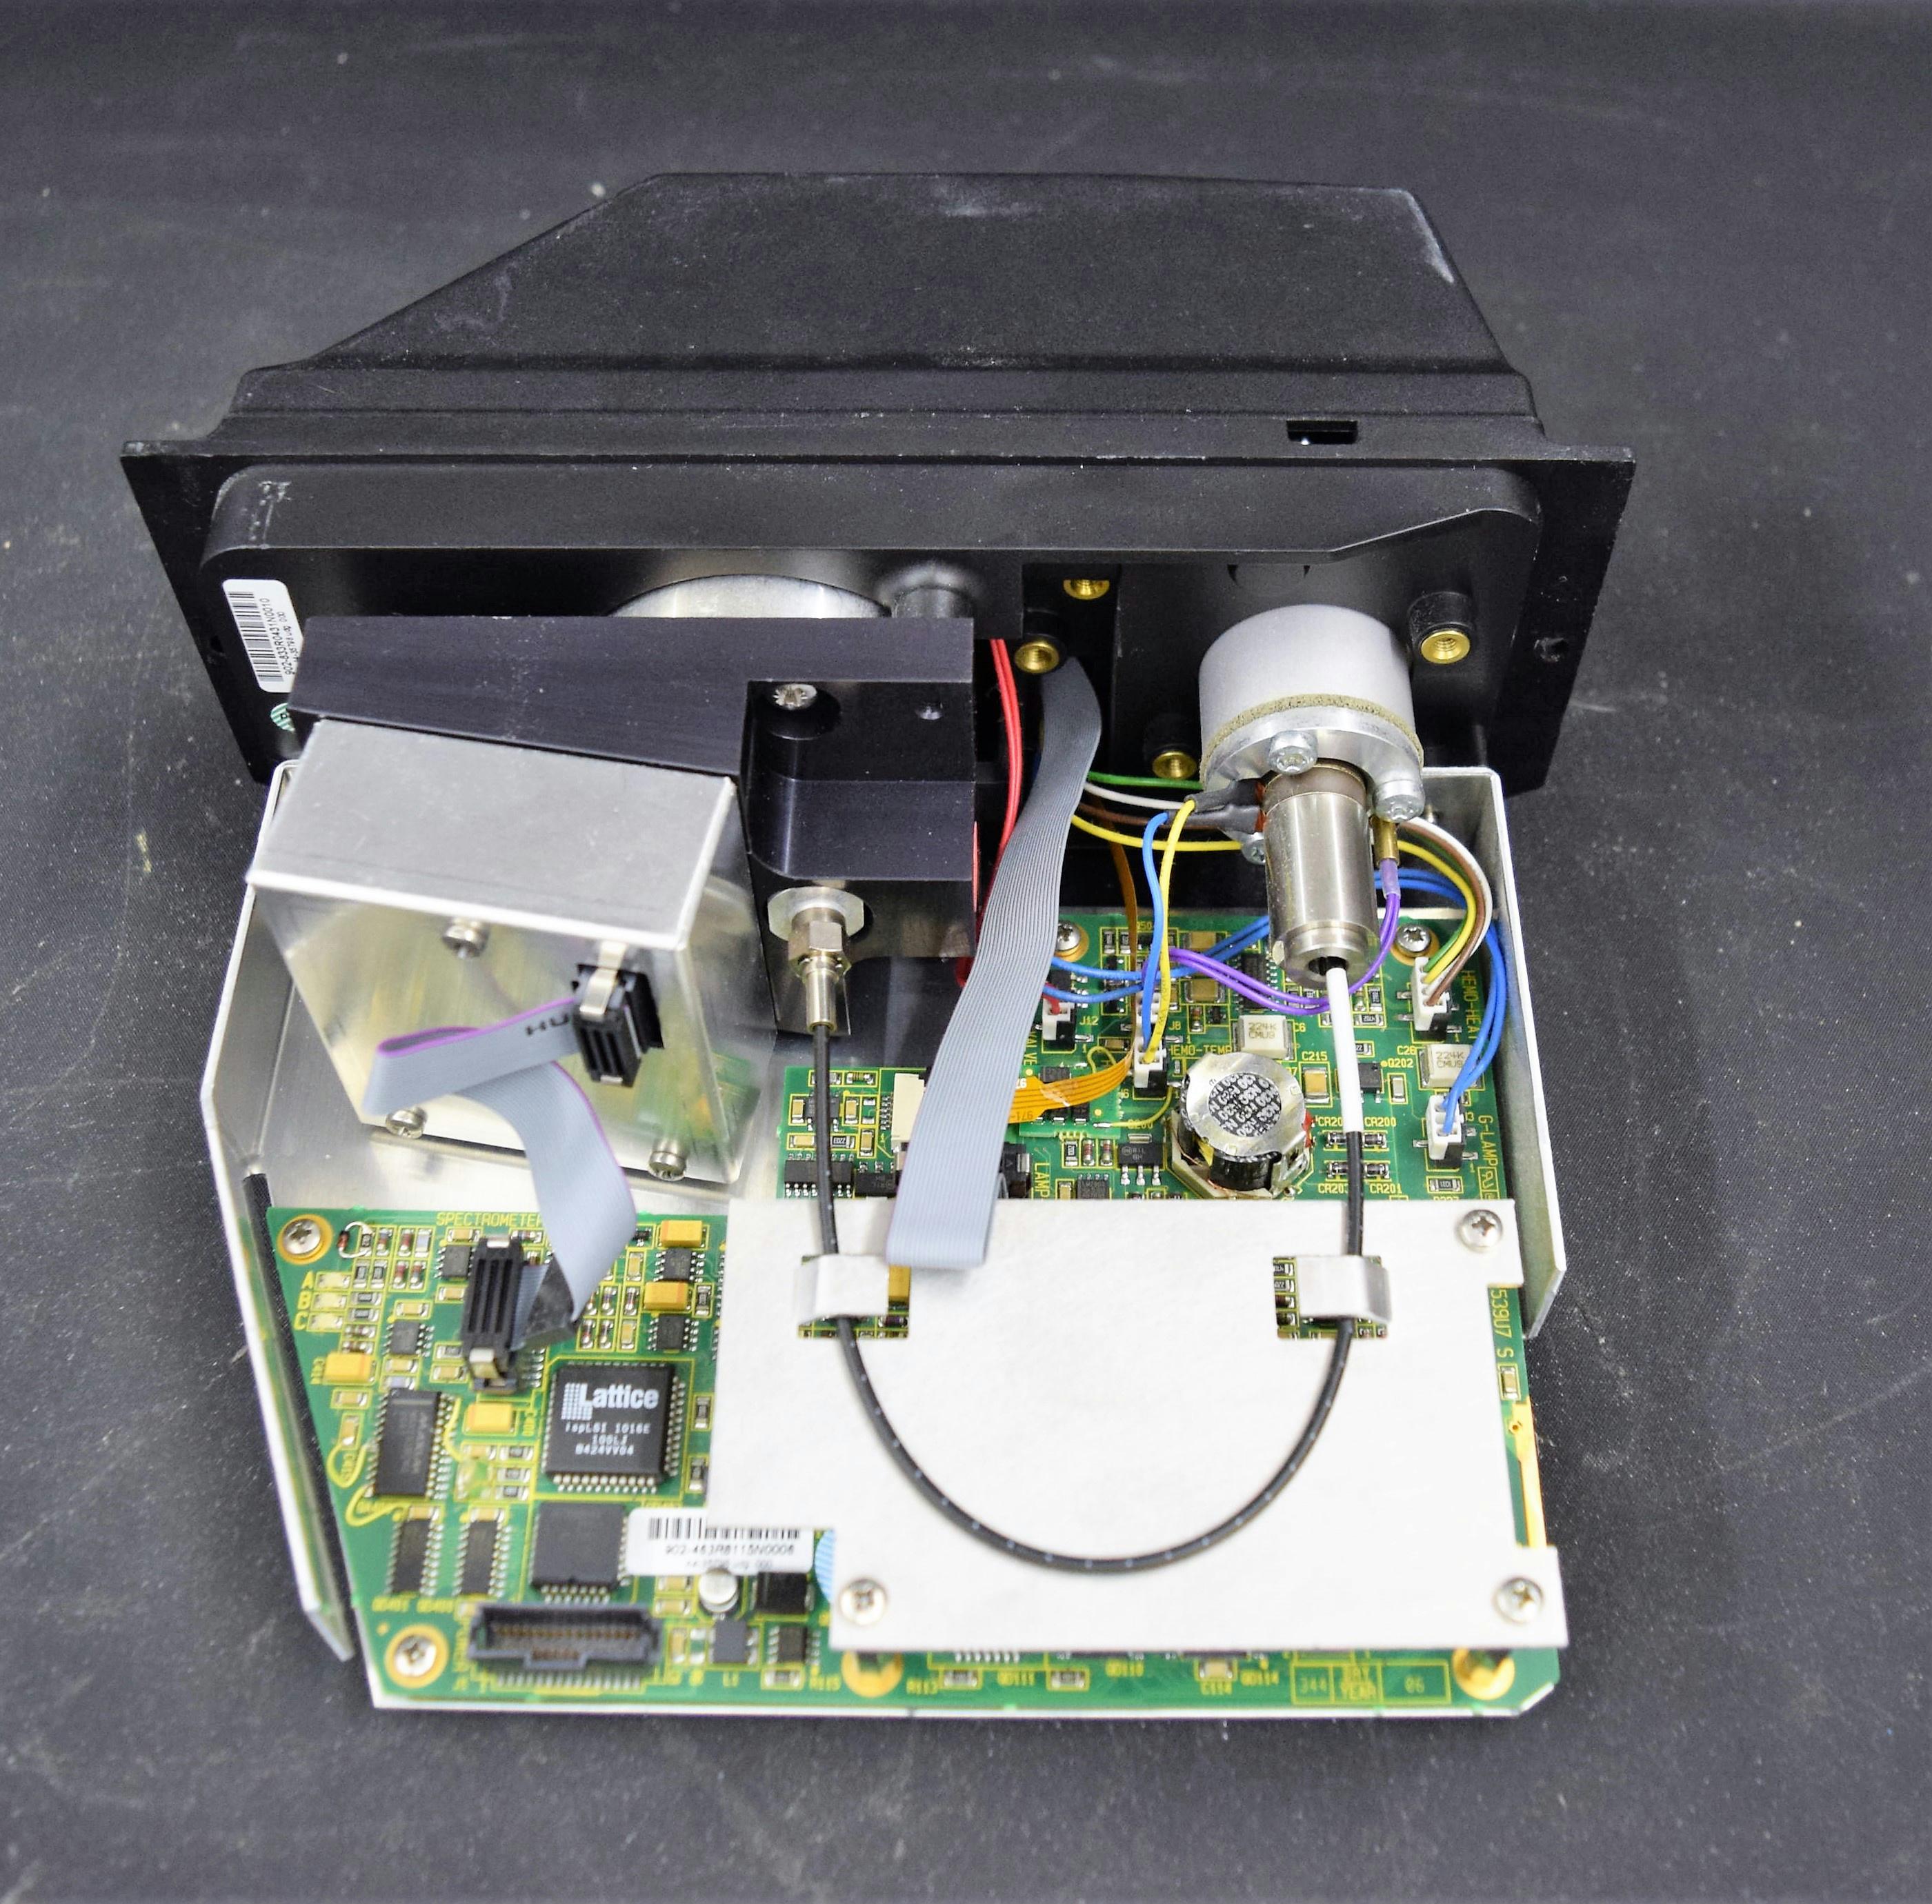 Radiometer ABL 800 Flex Blood Gas Analyzer Hemo Heat G Lamp P/N: 971 539U7